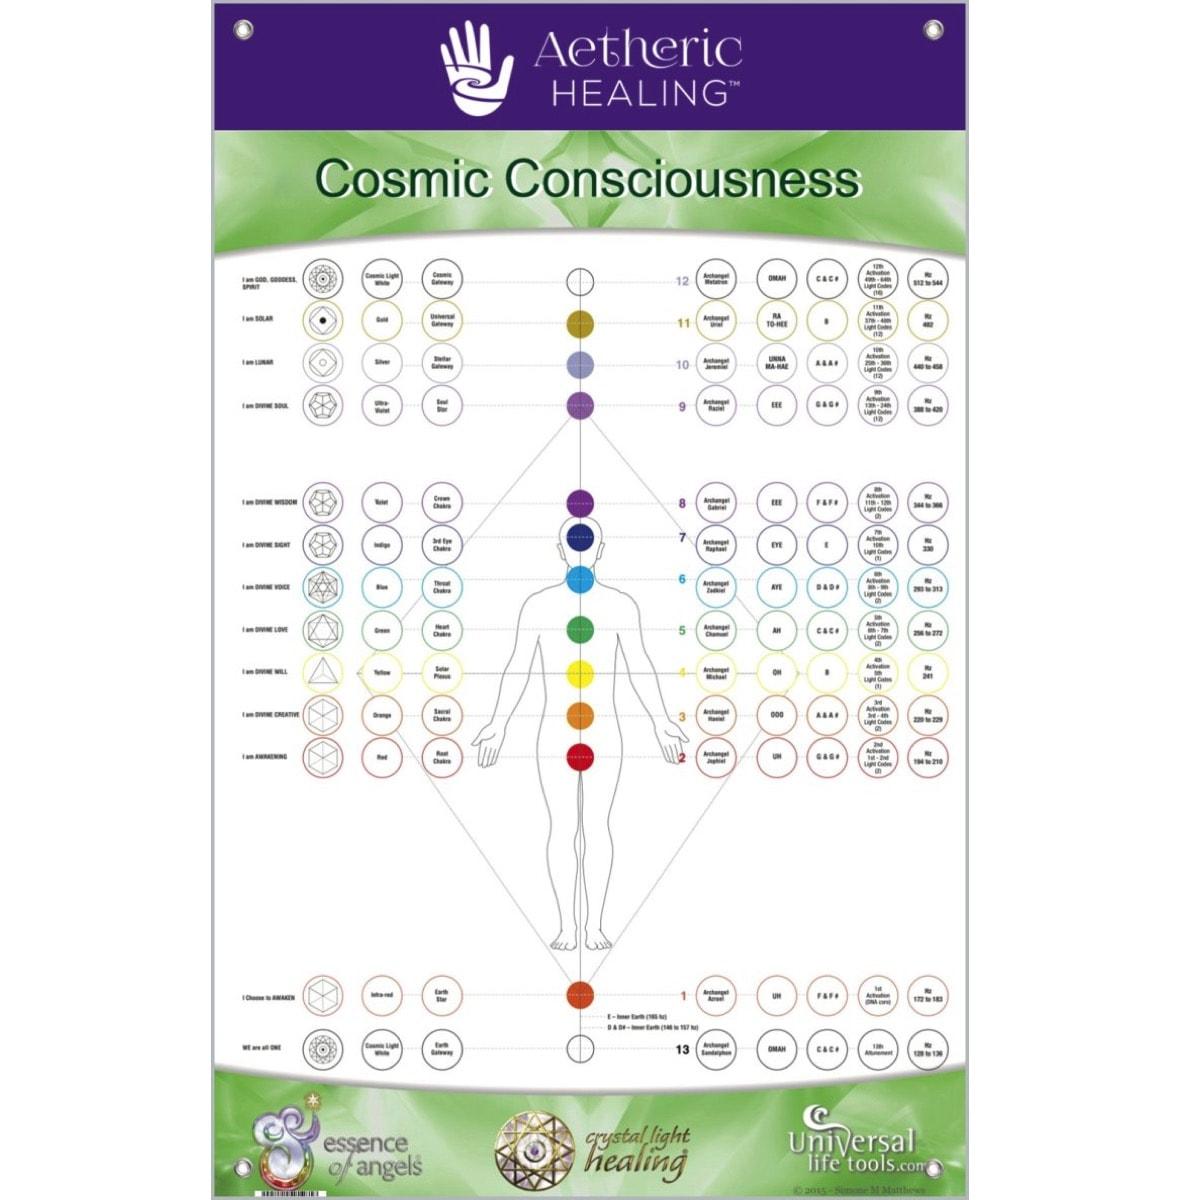 Aetheric Healing Key learnings 7